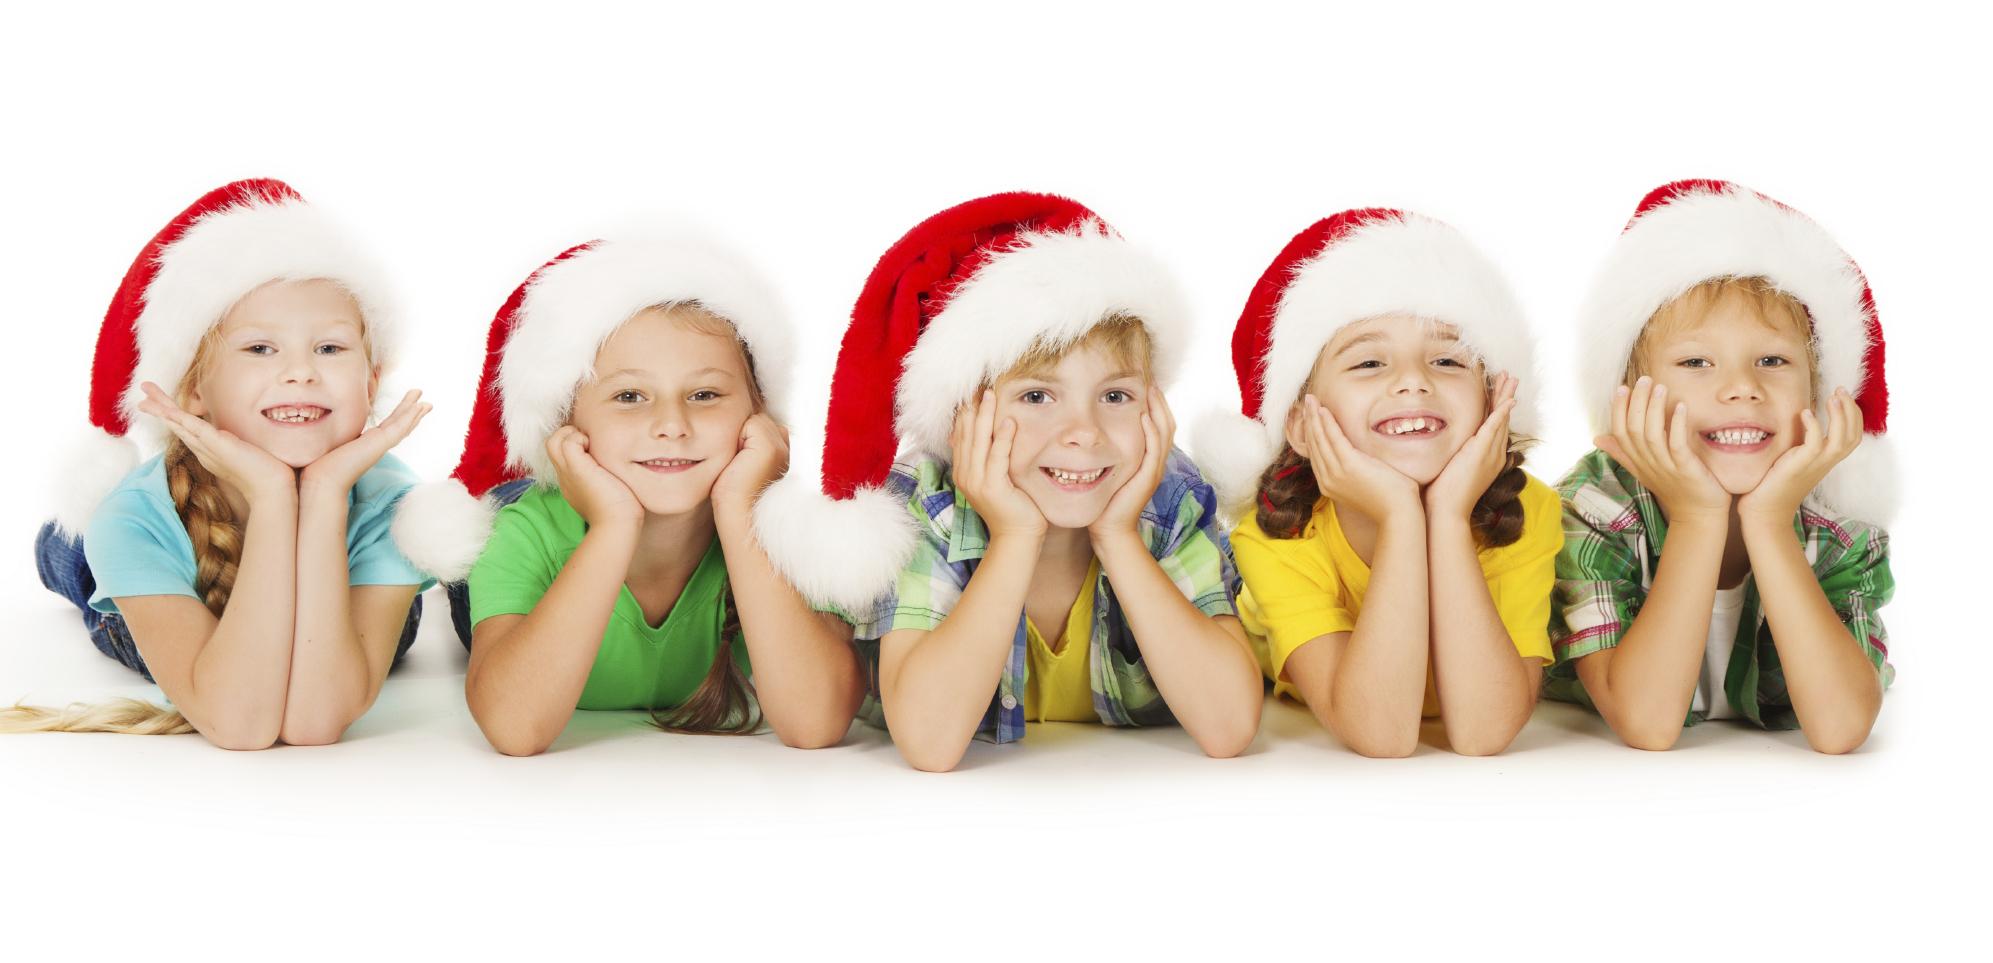 group of happy christmas kids in santa hat lying down white background cokesbury church - Kids Christmas